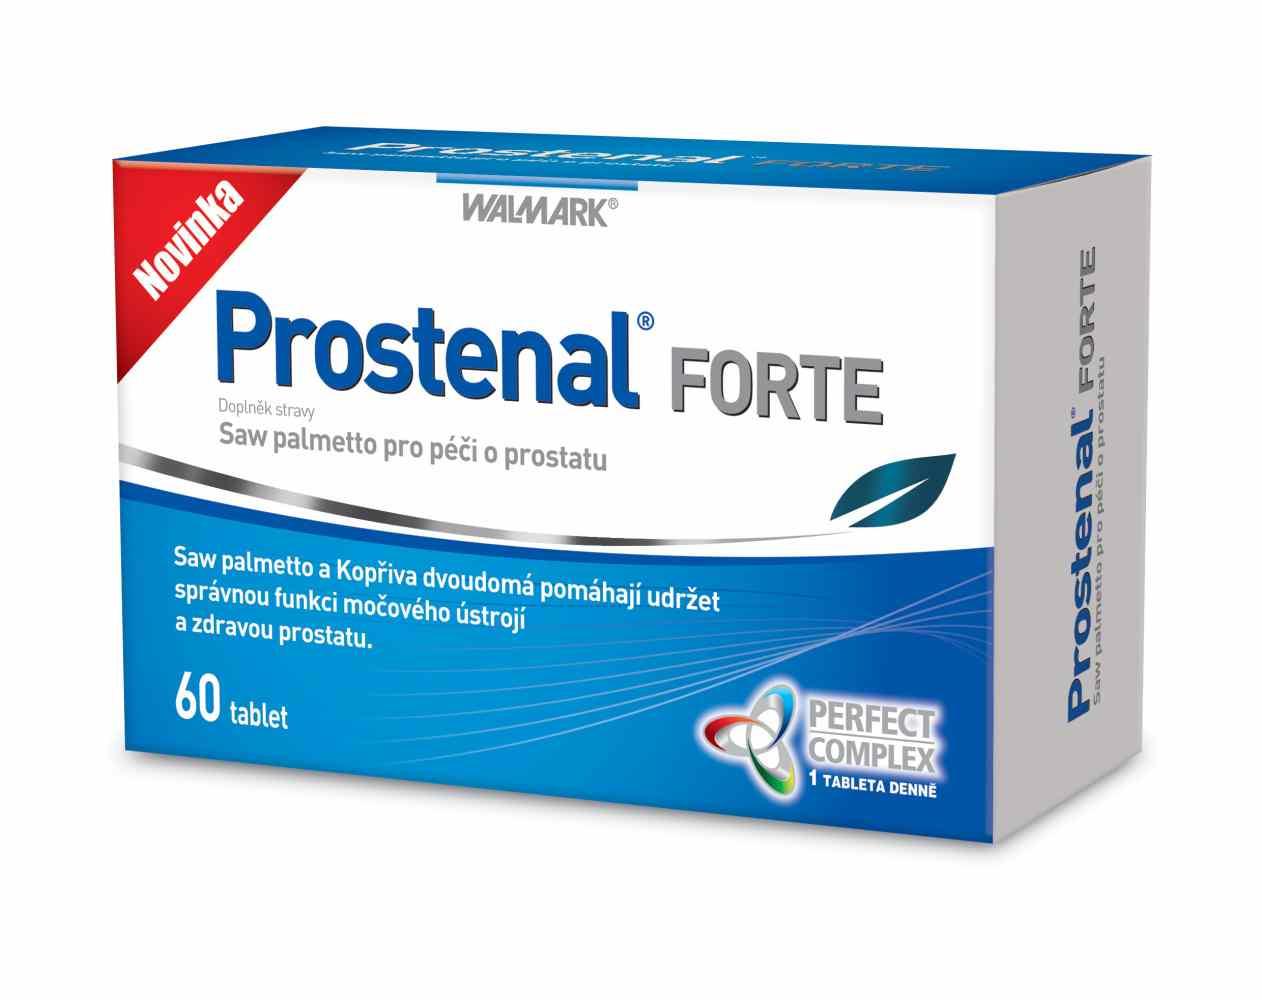 Walmark Prostenal Forte 60 tbl.